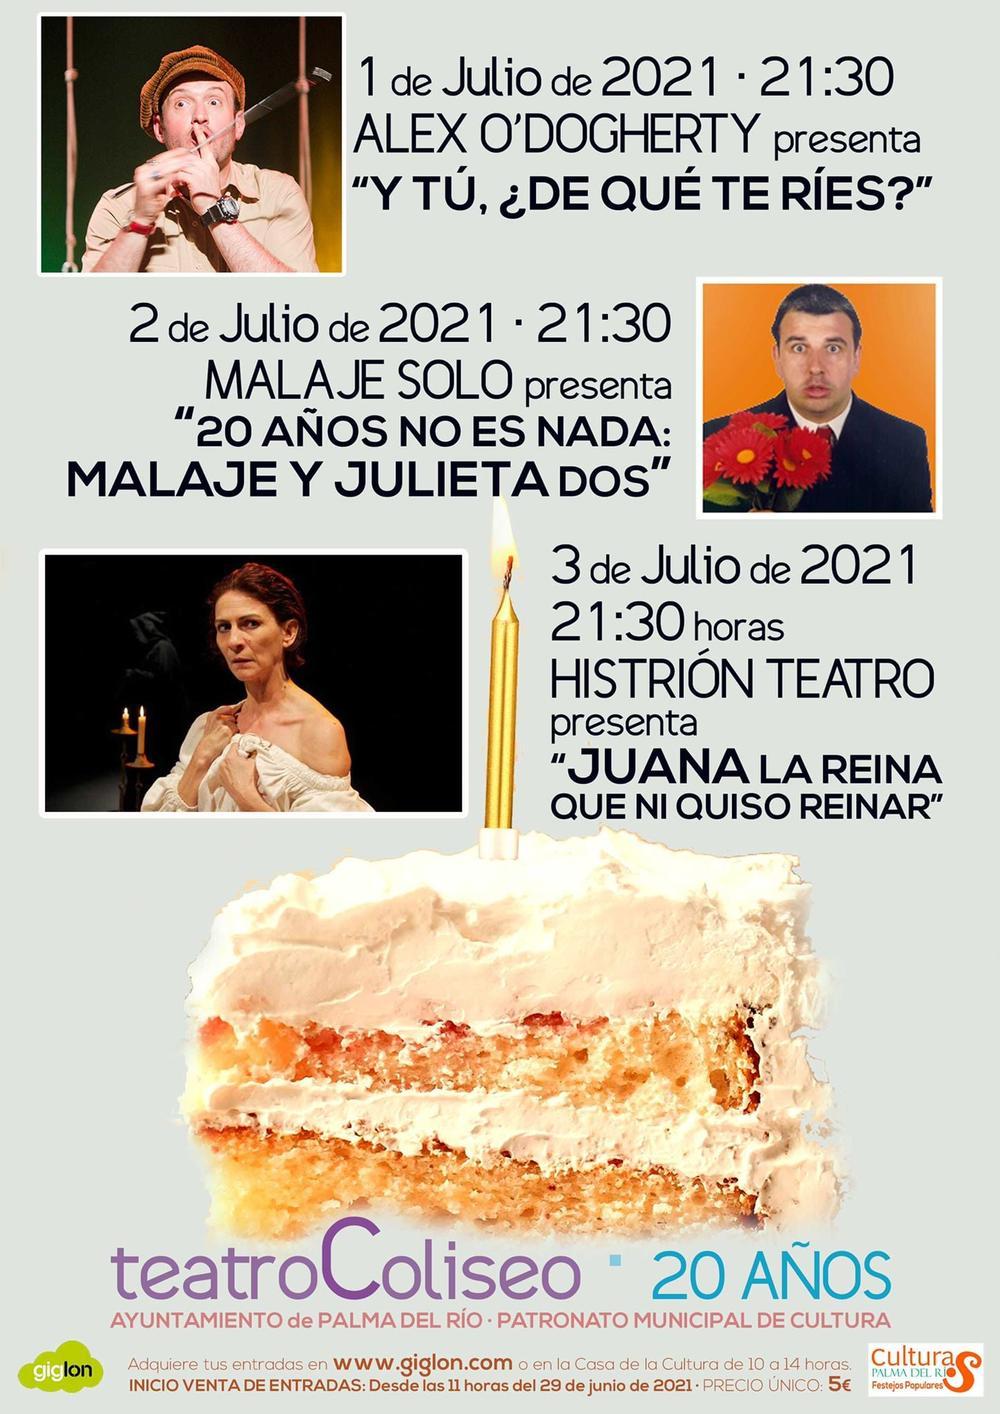 https://www.palmadelrio.es/sites/default/files/20_anos_teatro_coliseo.jpg